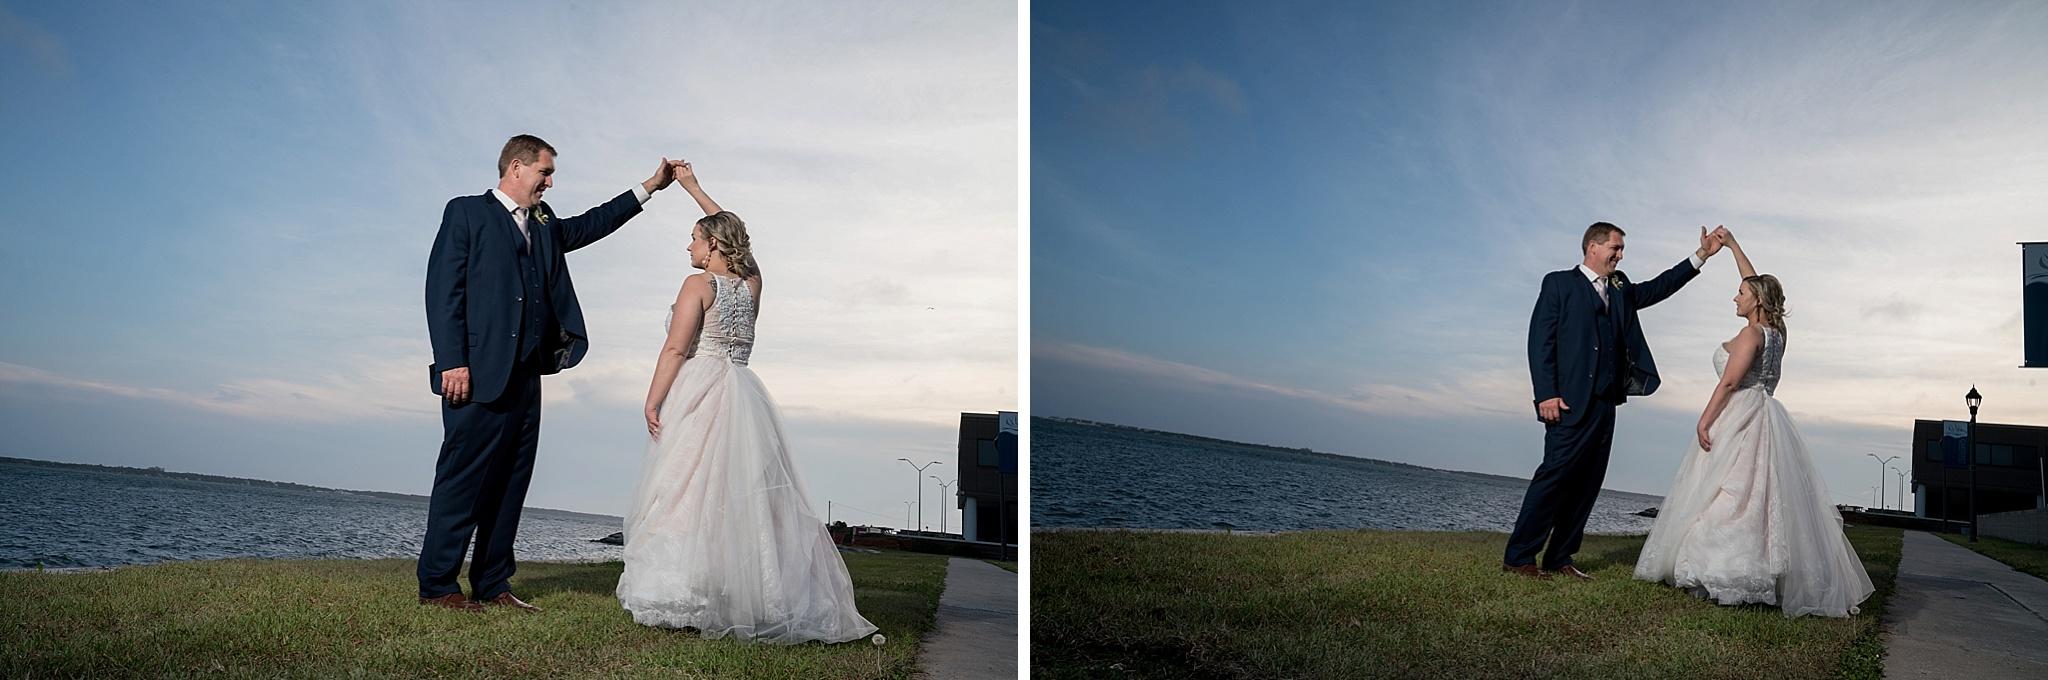 Crystal-Coast-Wedding-Photographer-055.jpg